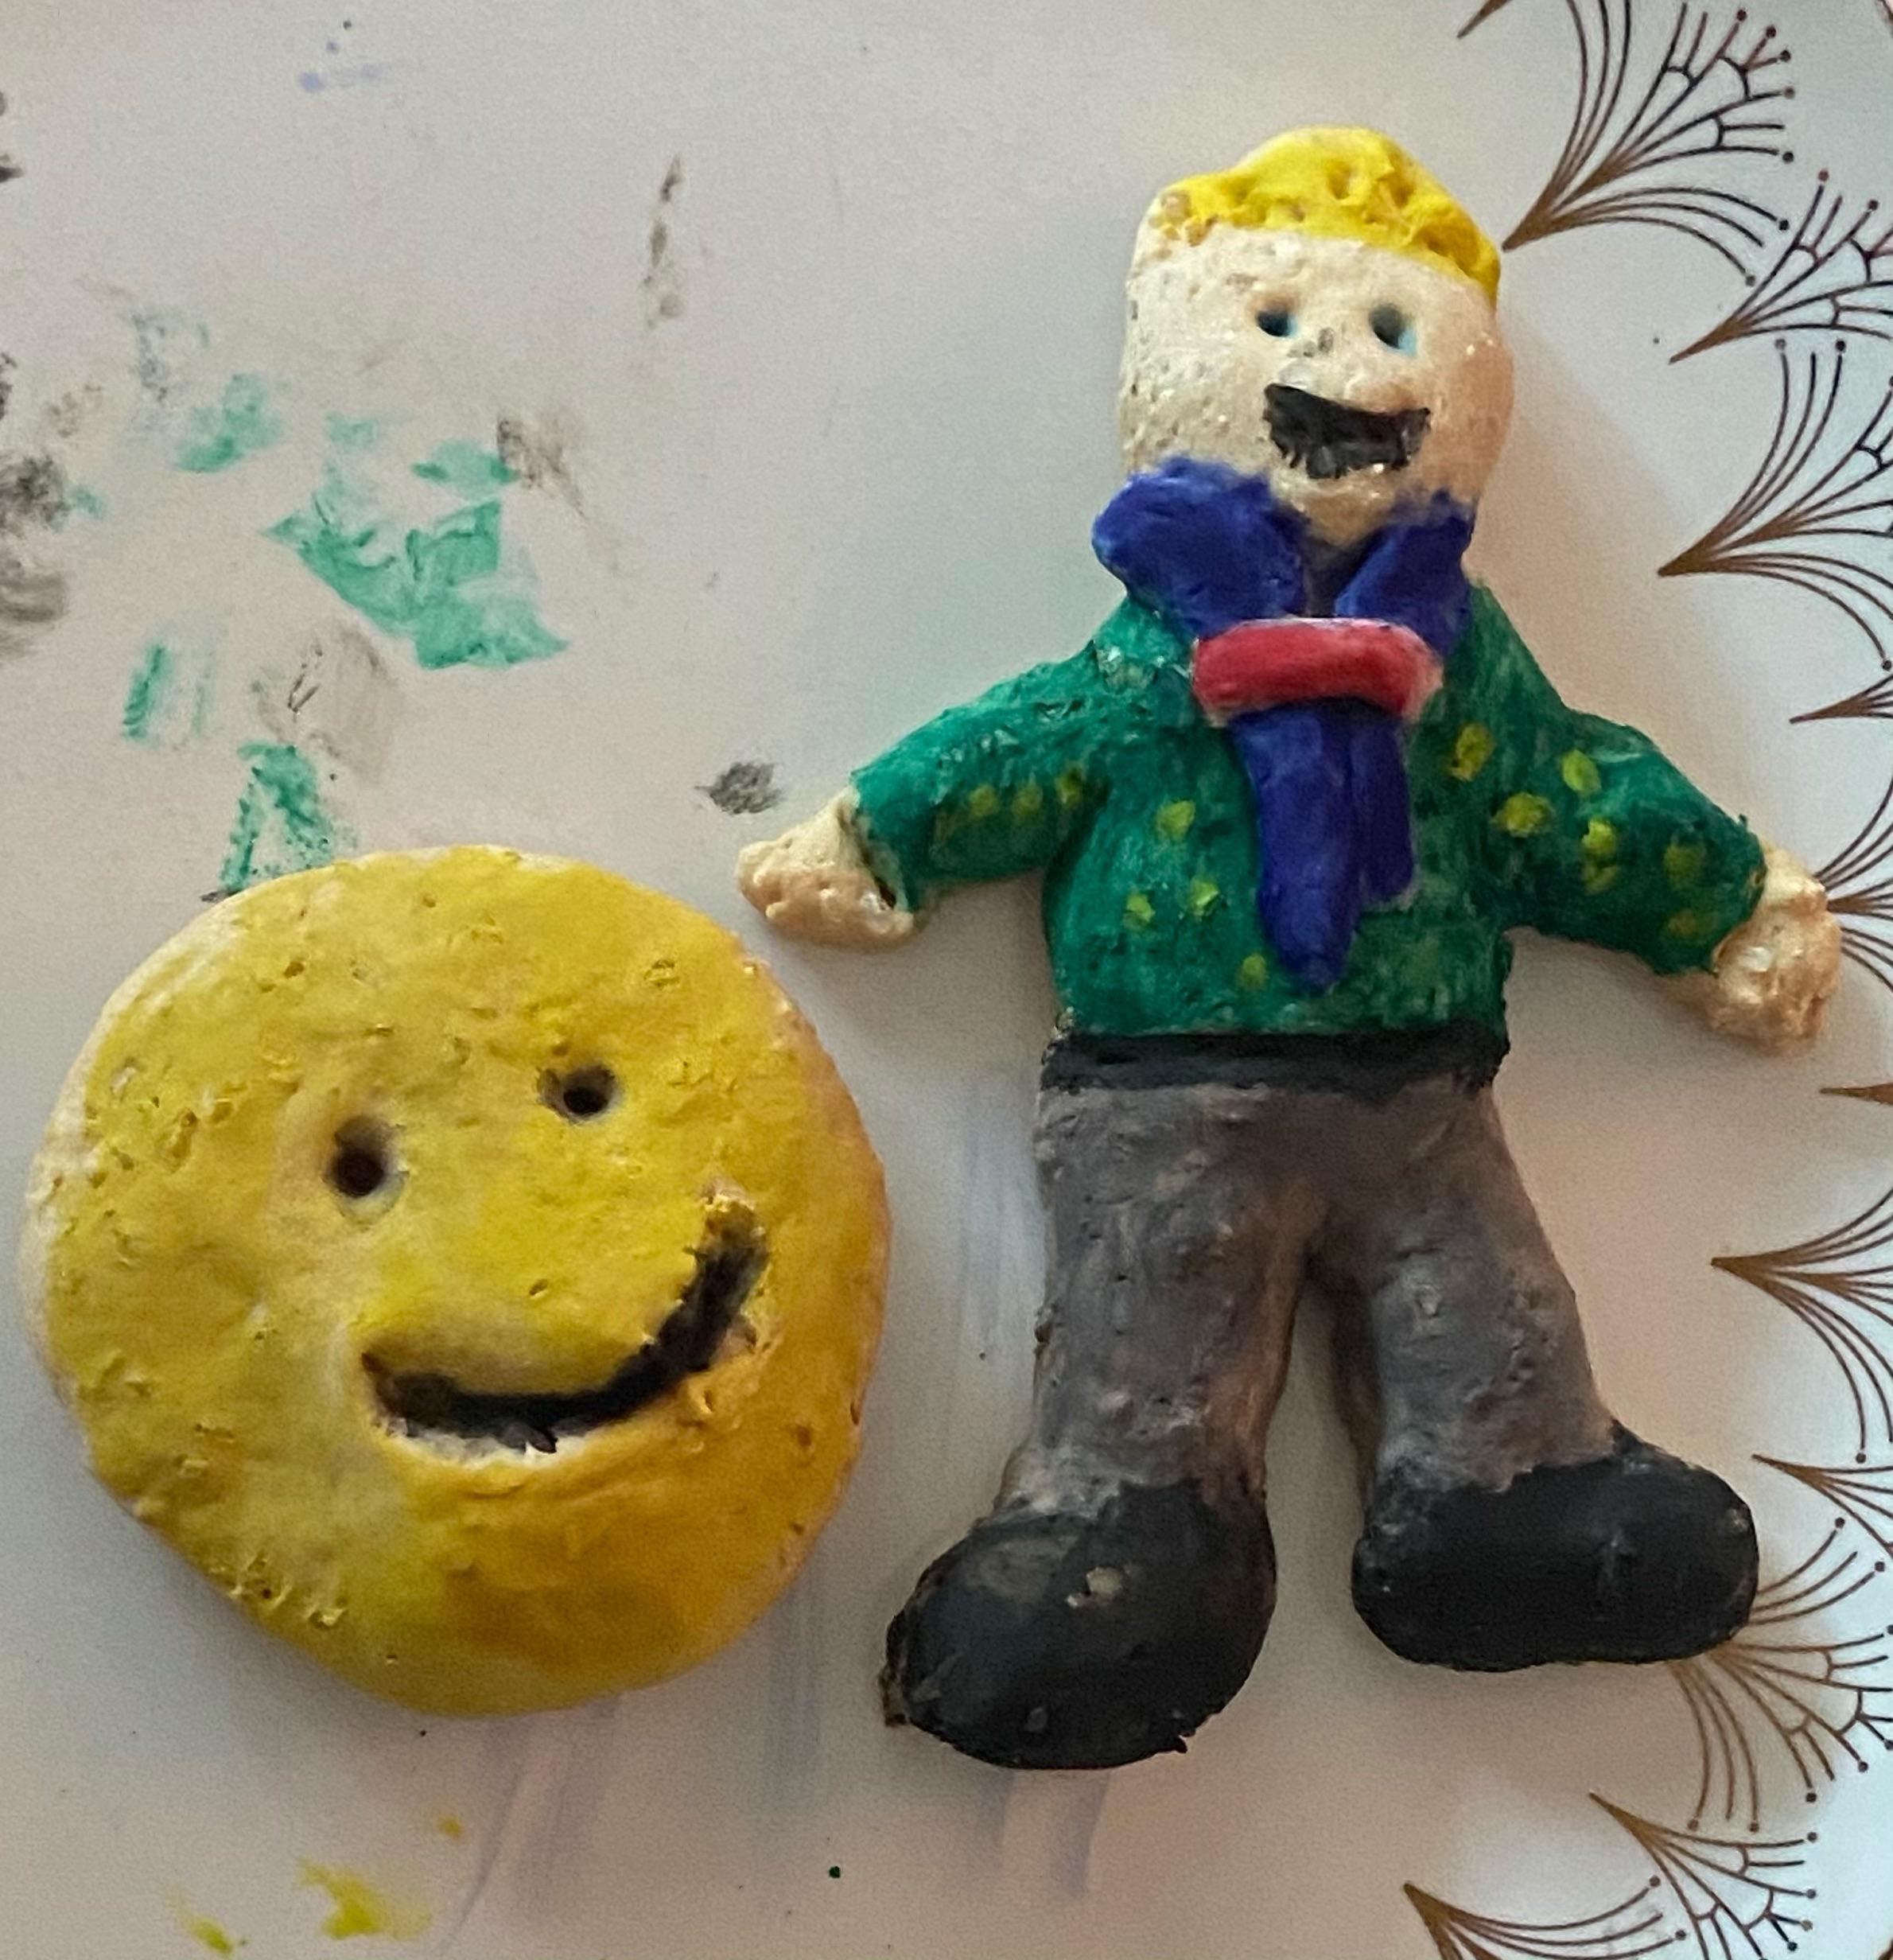 Salt dough of a cub and smiley face